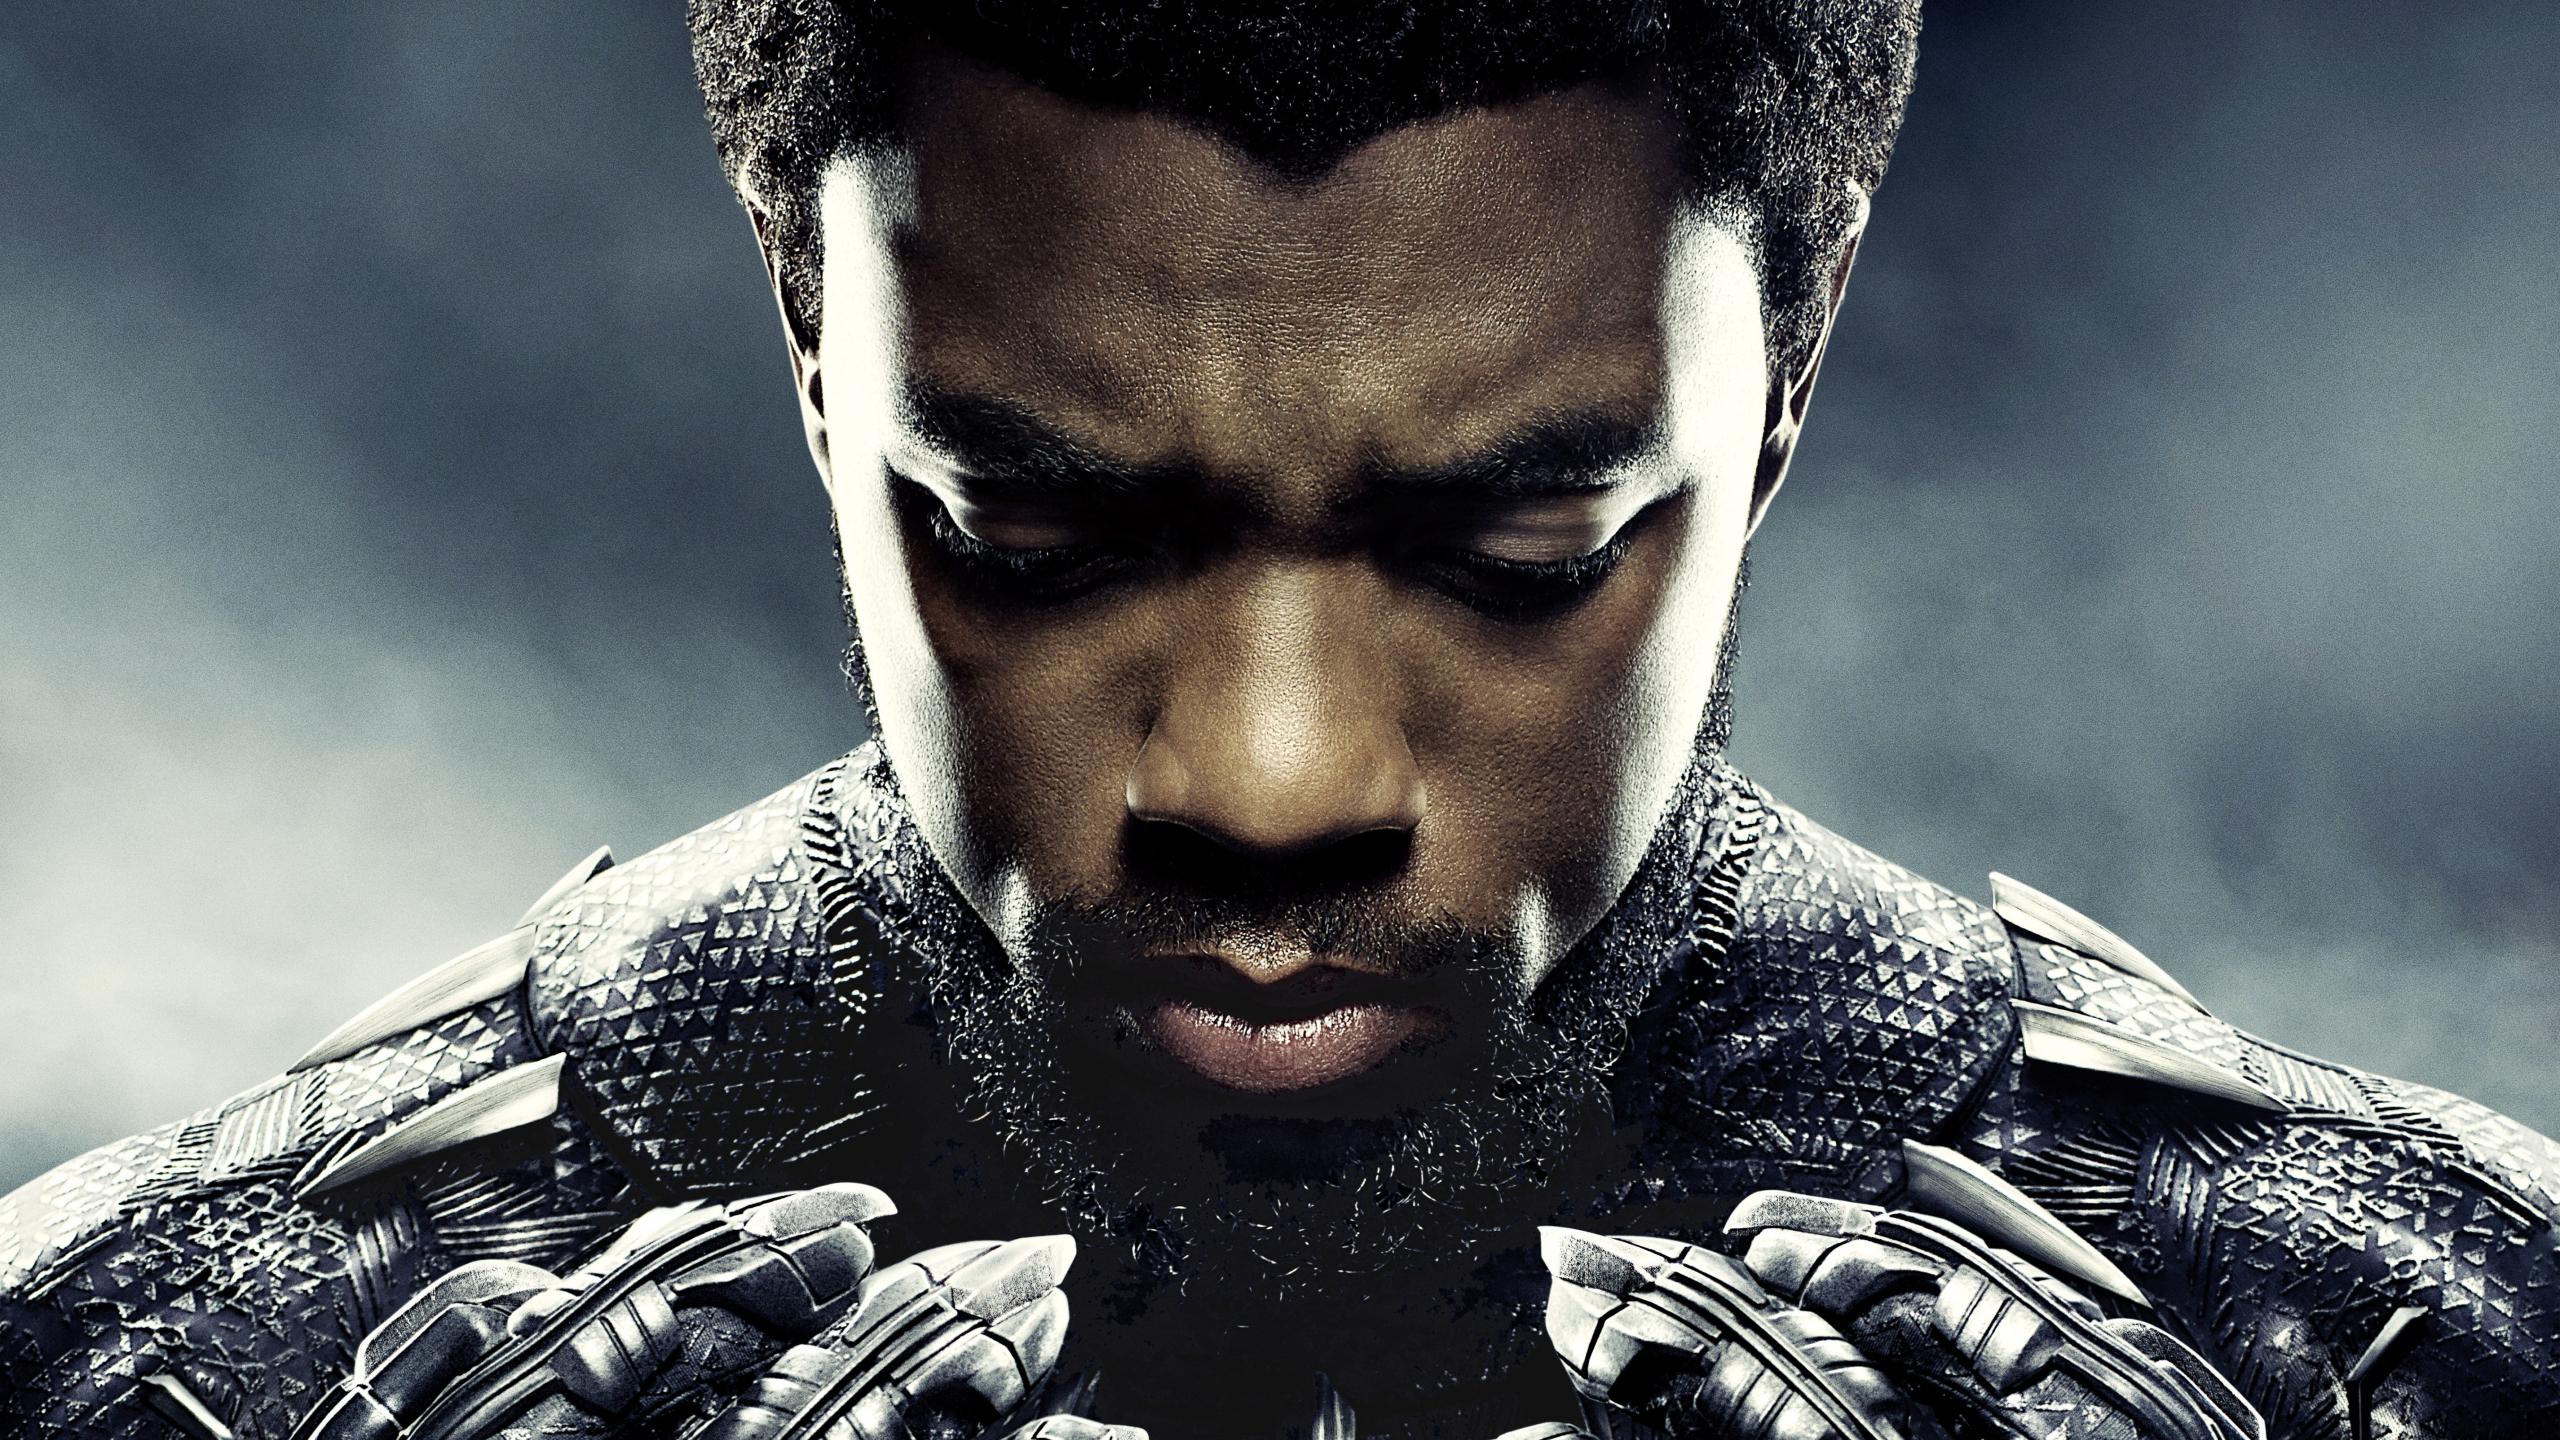 Desktop Wallpaper Black Panther Movie Chadwick Boseman 2018 Movie Superhero 5k Hd Image Picture Background 34ab1c